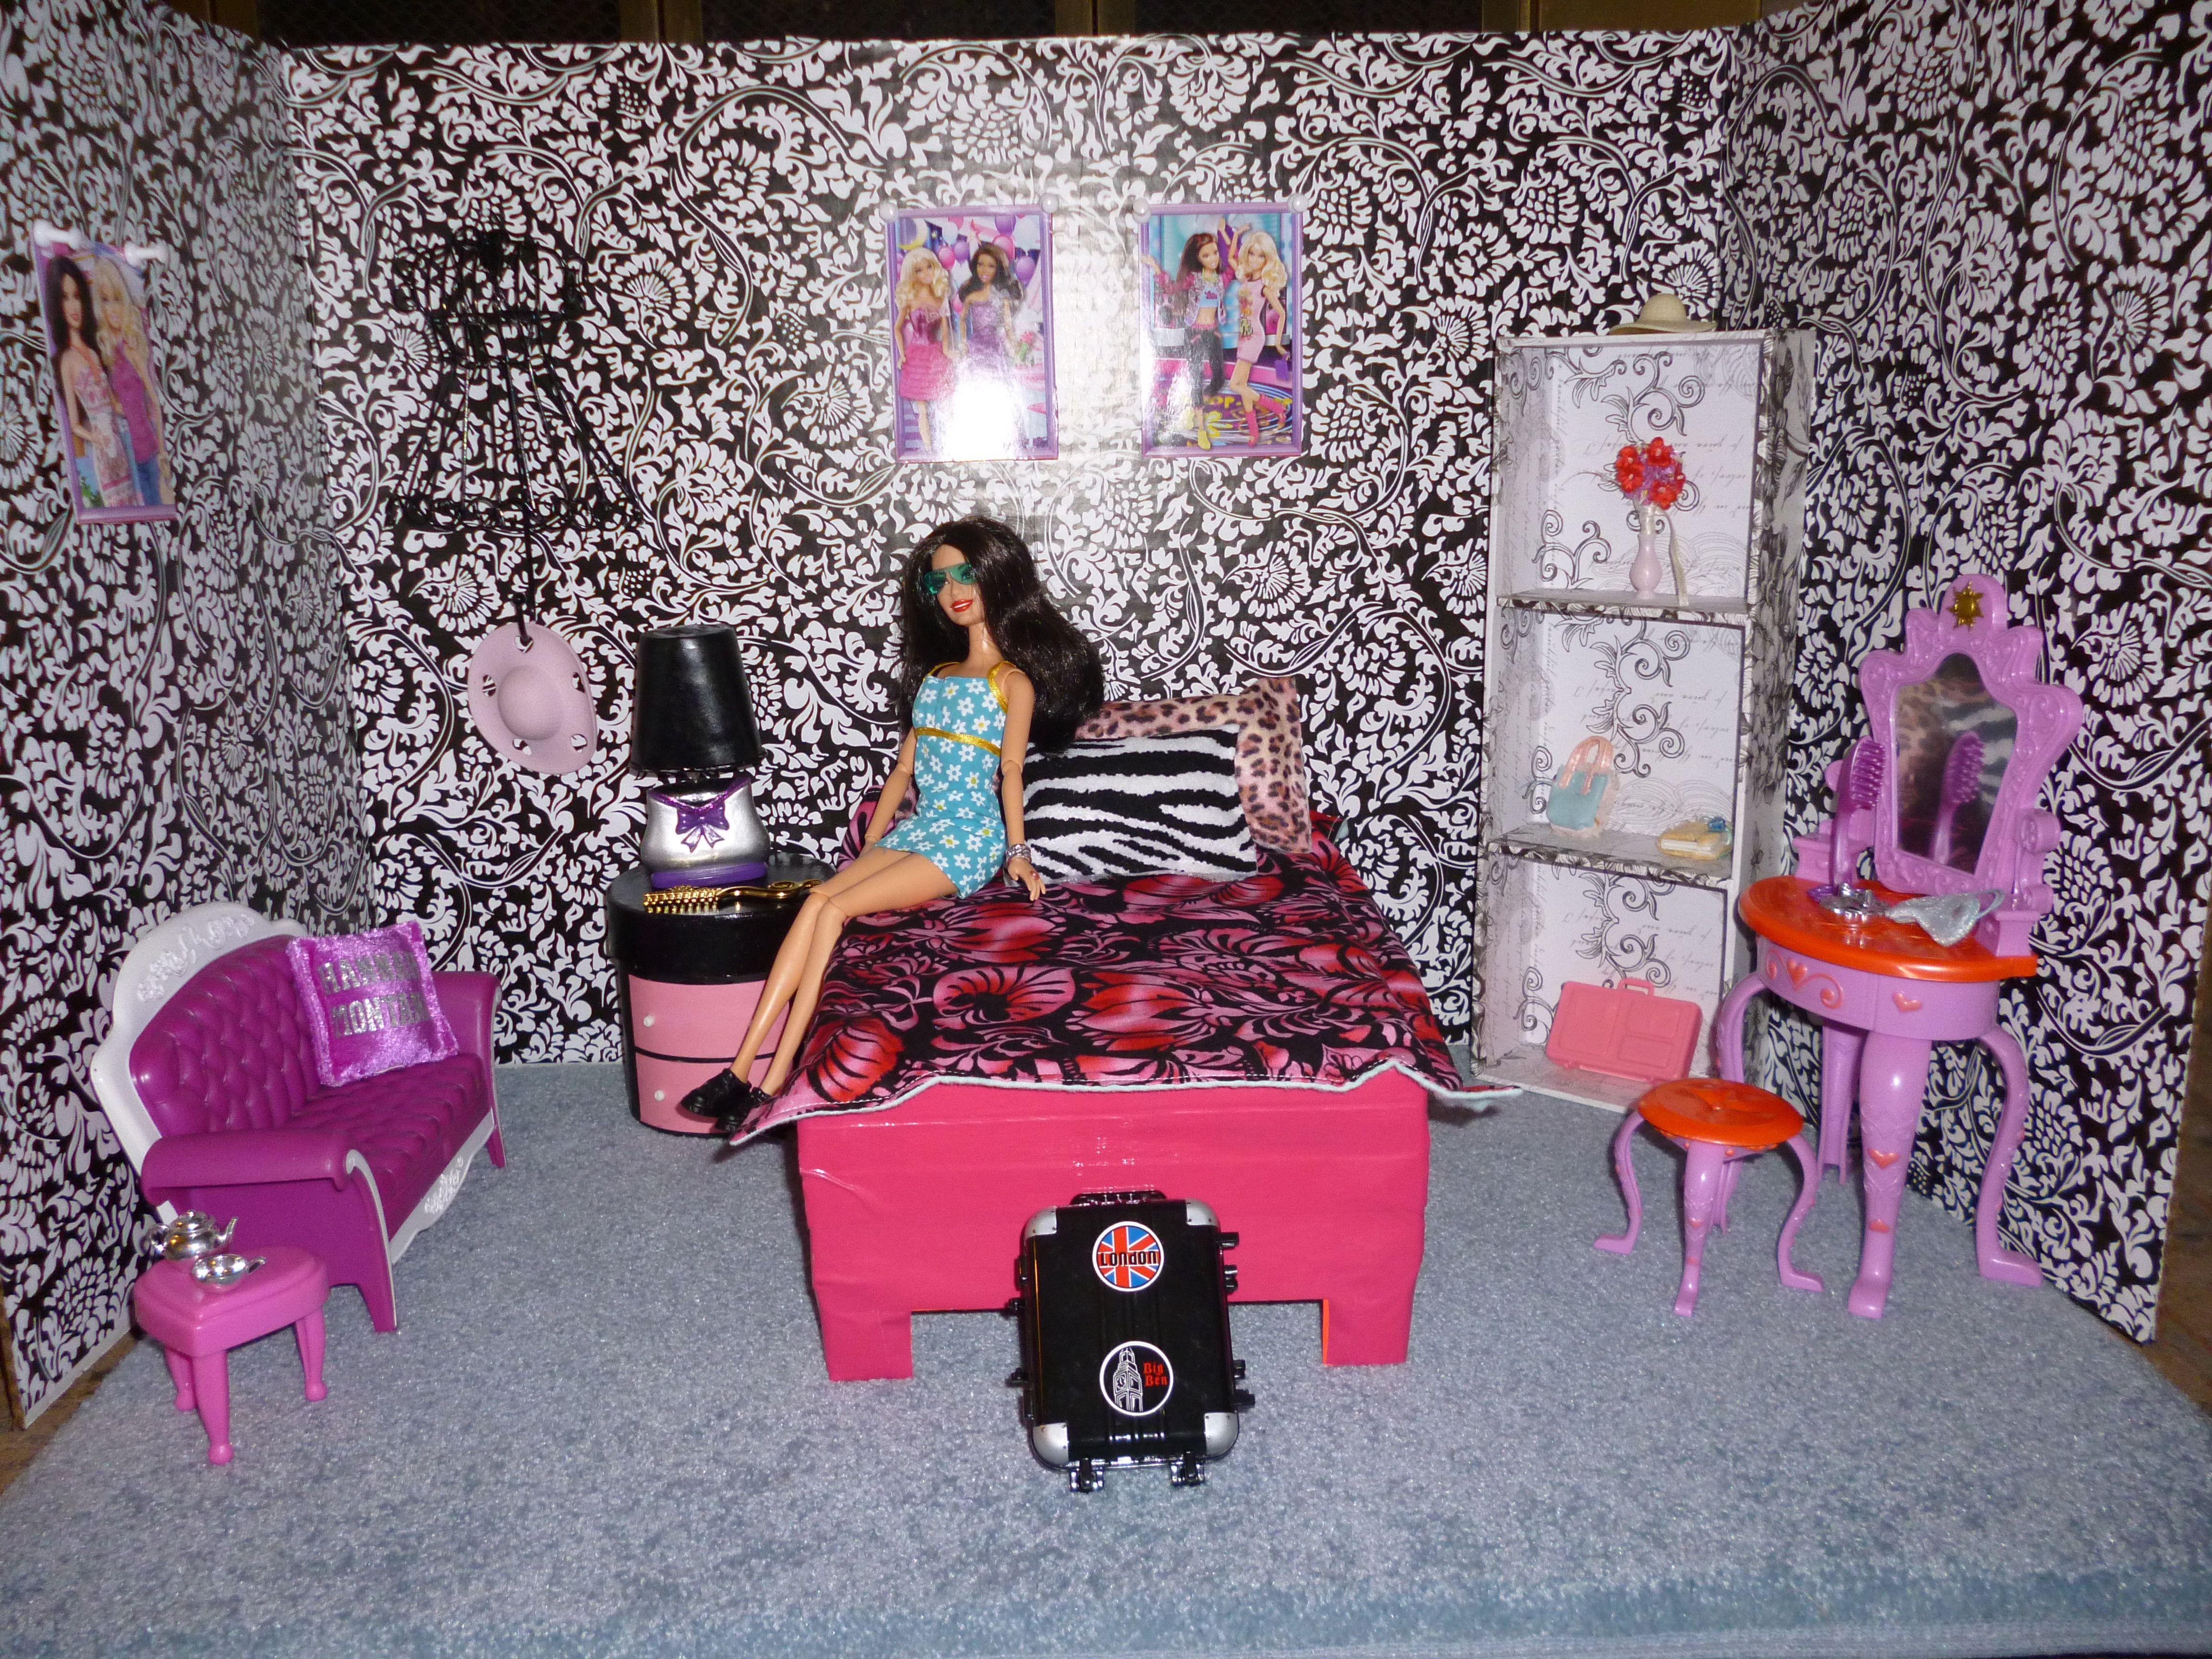 dreaded schemes purple s home paint for colors romantic room barbie dazzling design scheme teen ikea minimalist excerpt girls decor designs teenage astounding bedroom models in imanada teens cheap color ideas